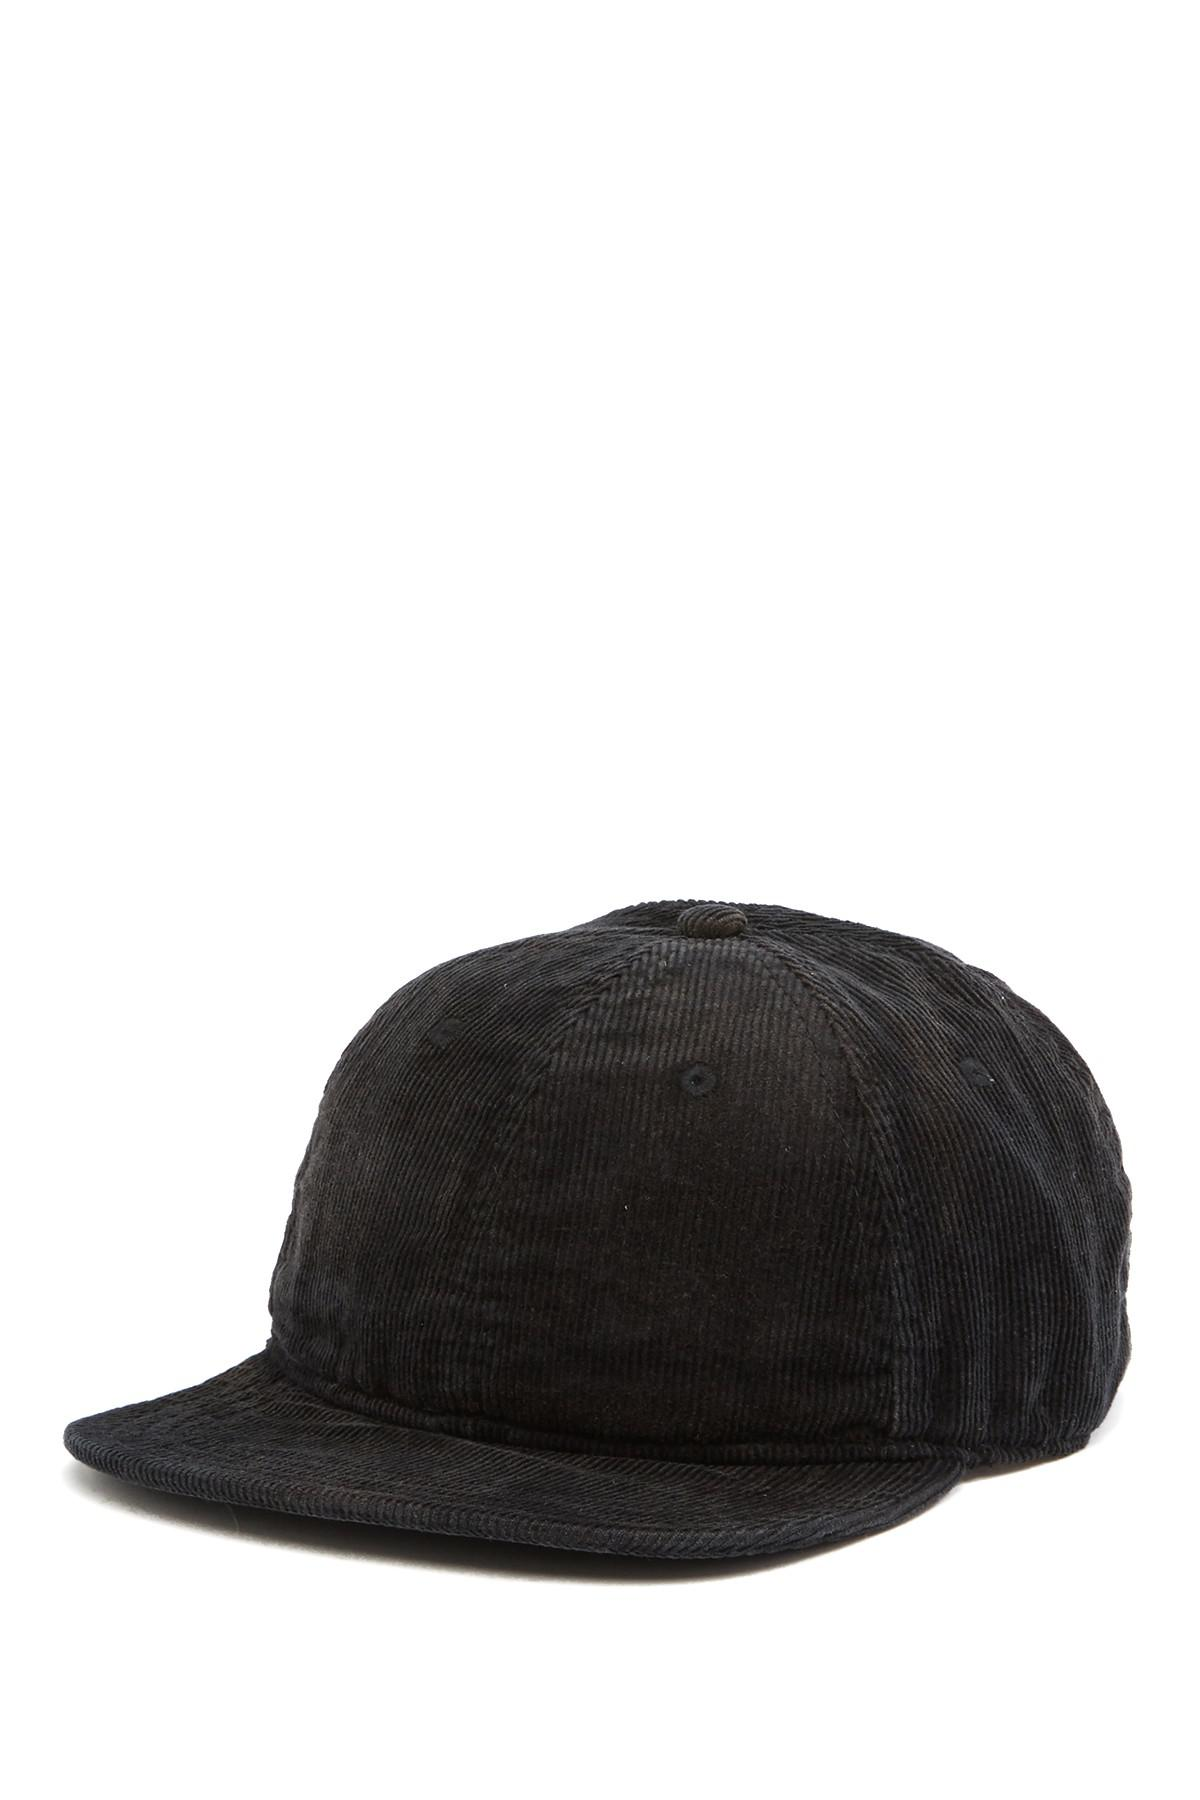 5778ef71a1e Lyst - Goorin Bros Fisher Venice Strapback Hat in Black for Men